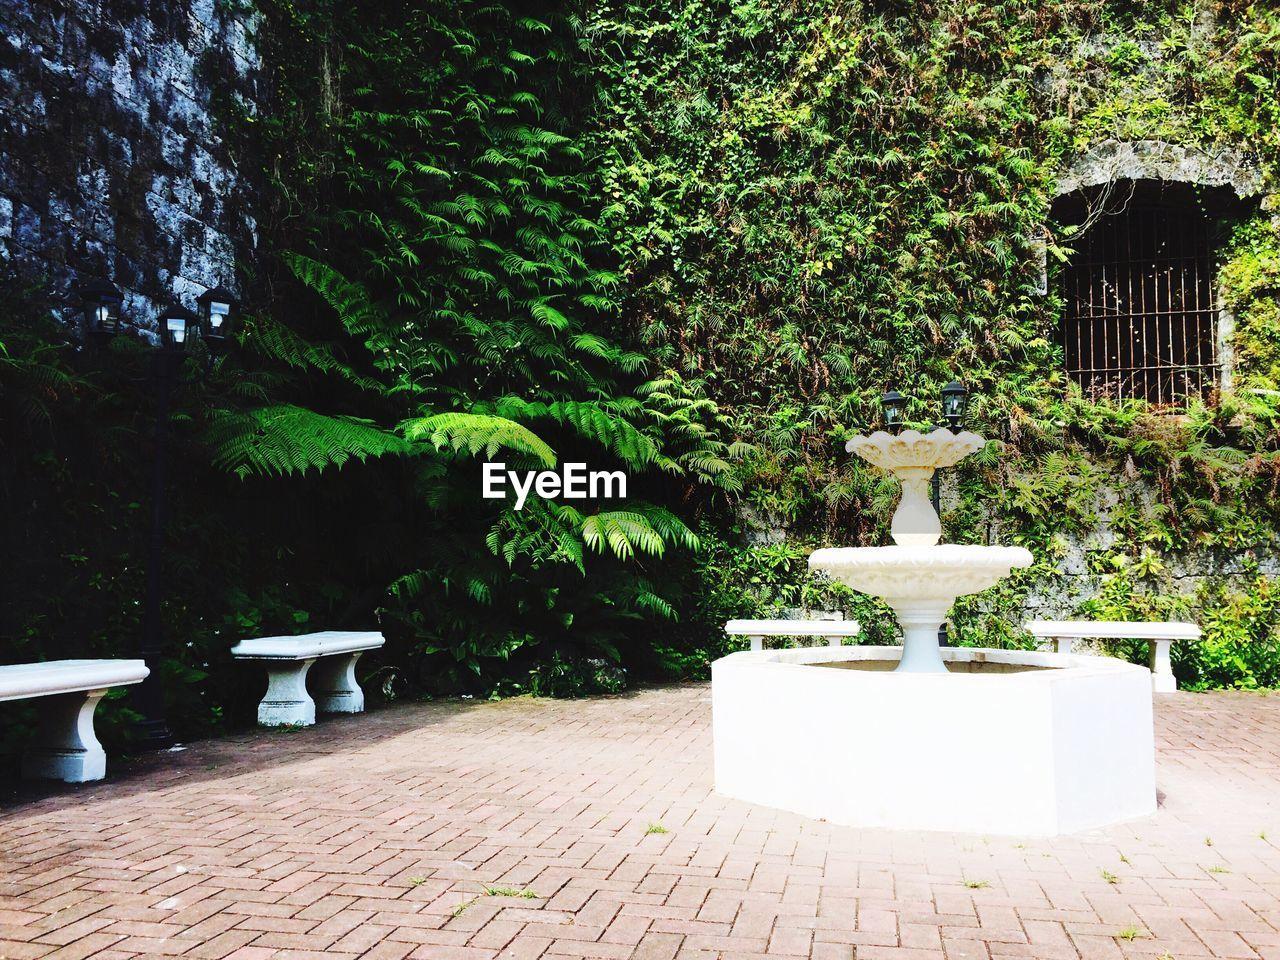 PLANTS AGAINST TREES